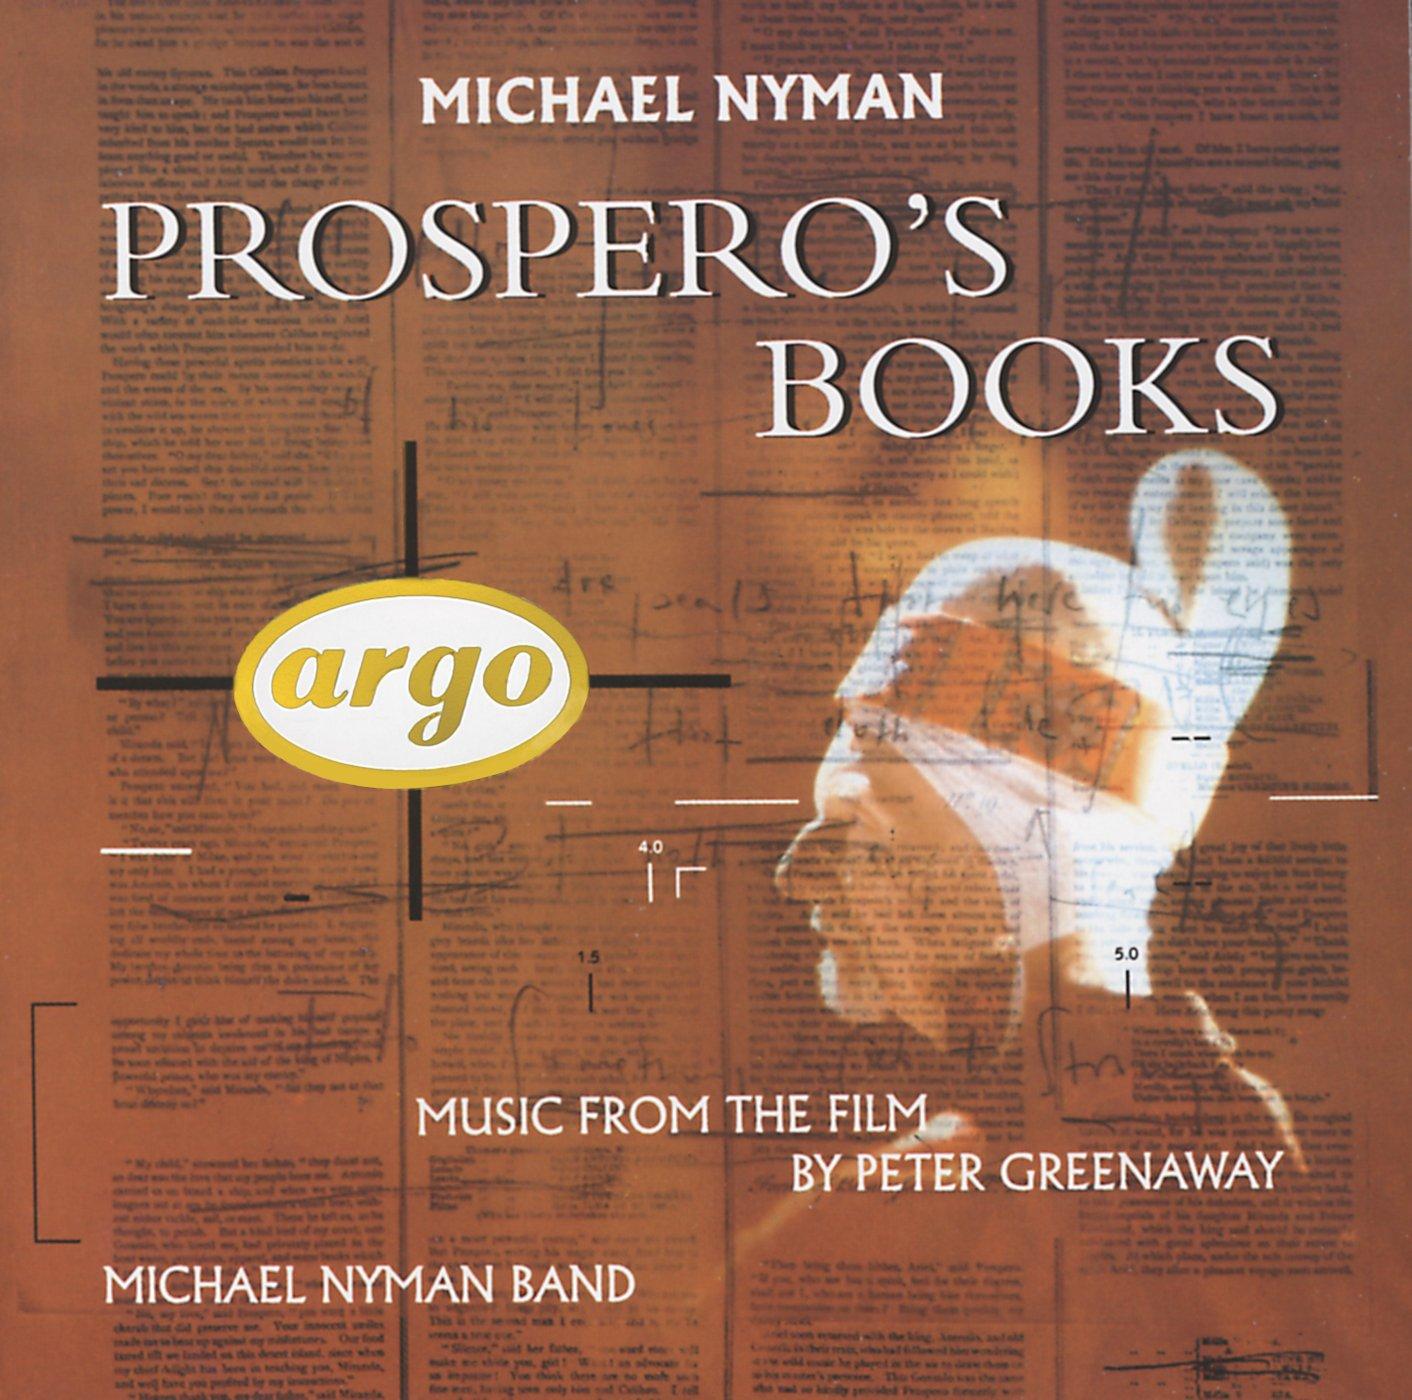 Michael Nyman, Sarah Leonard, Marie Angel, Ute Lemper, Deborah Conway,  Michael Nyman Band - Prospero's Books [Music from the Film by Peter  Greenaway] ...